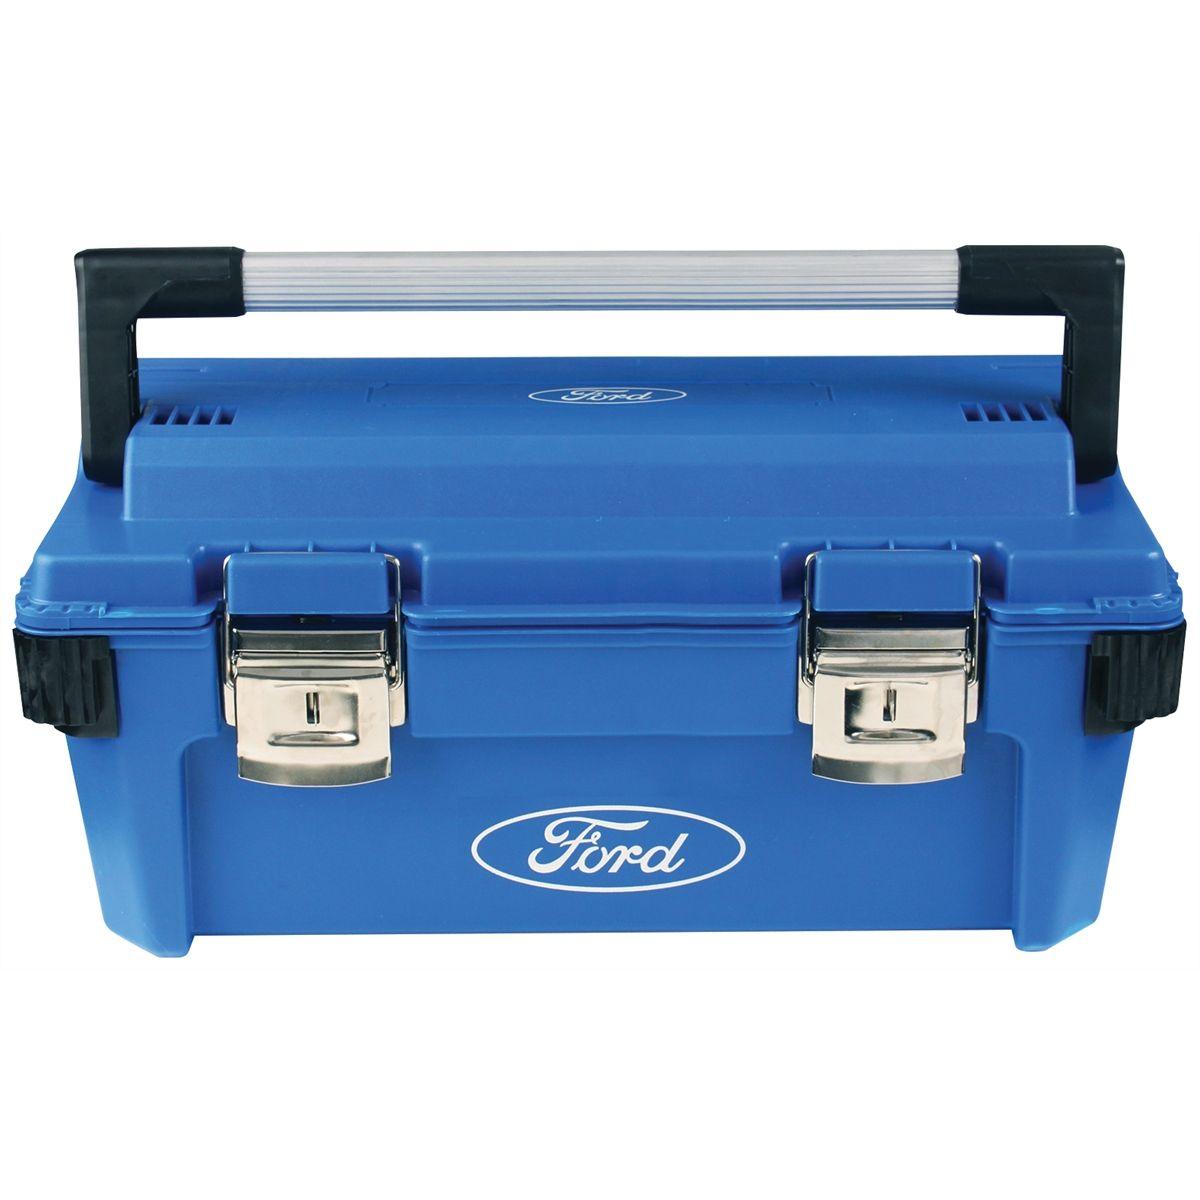 Ford Tool Box : Ford tools tool box hd plastic fmcfht